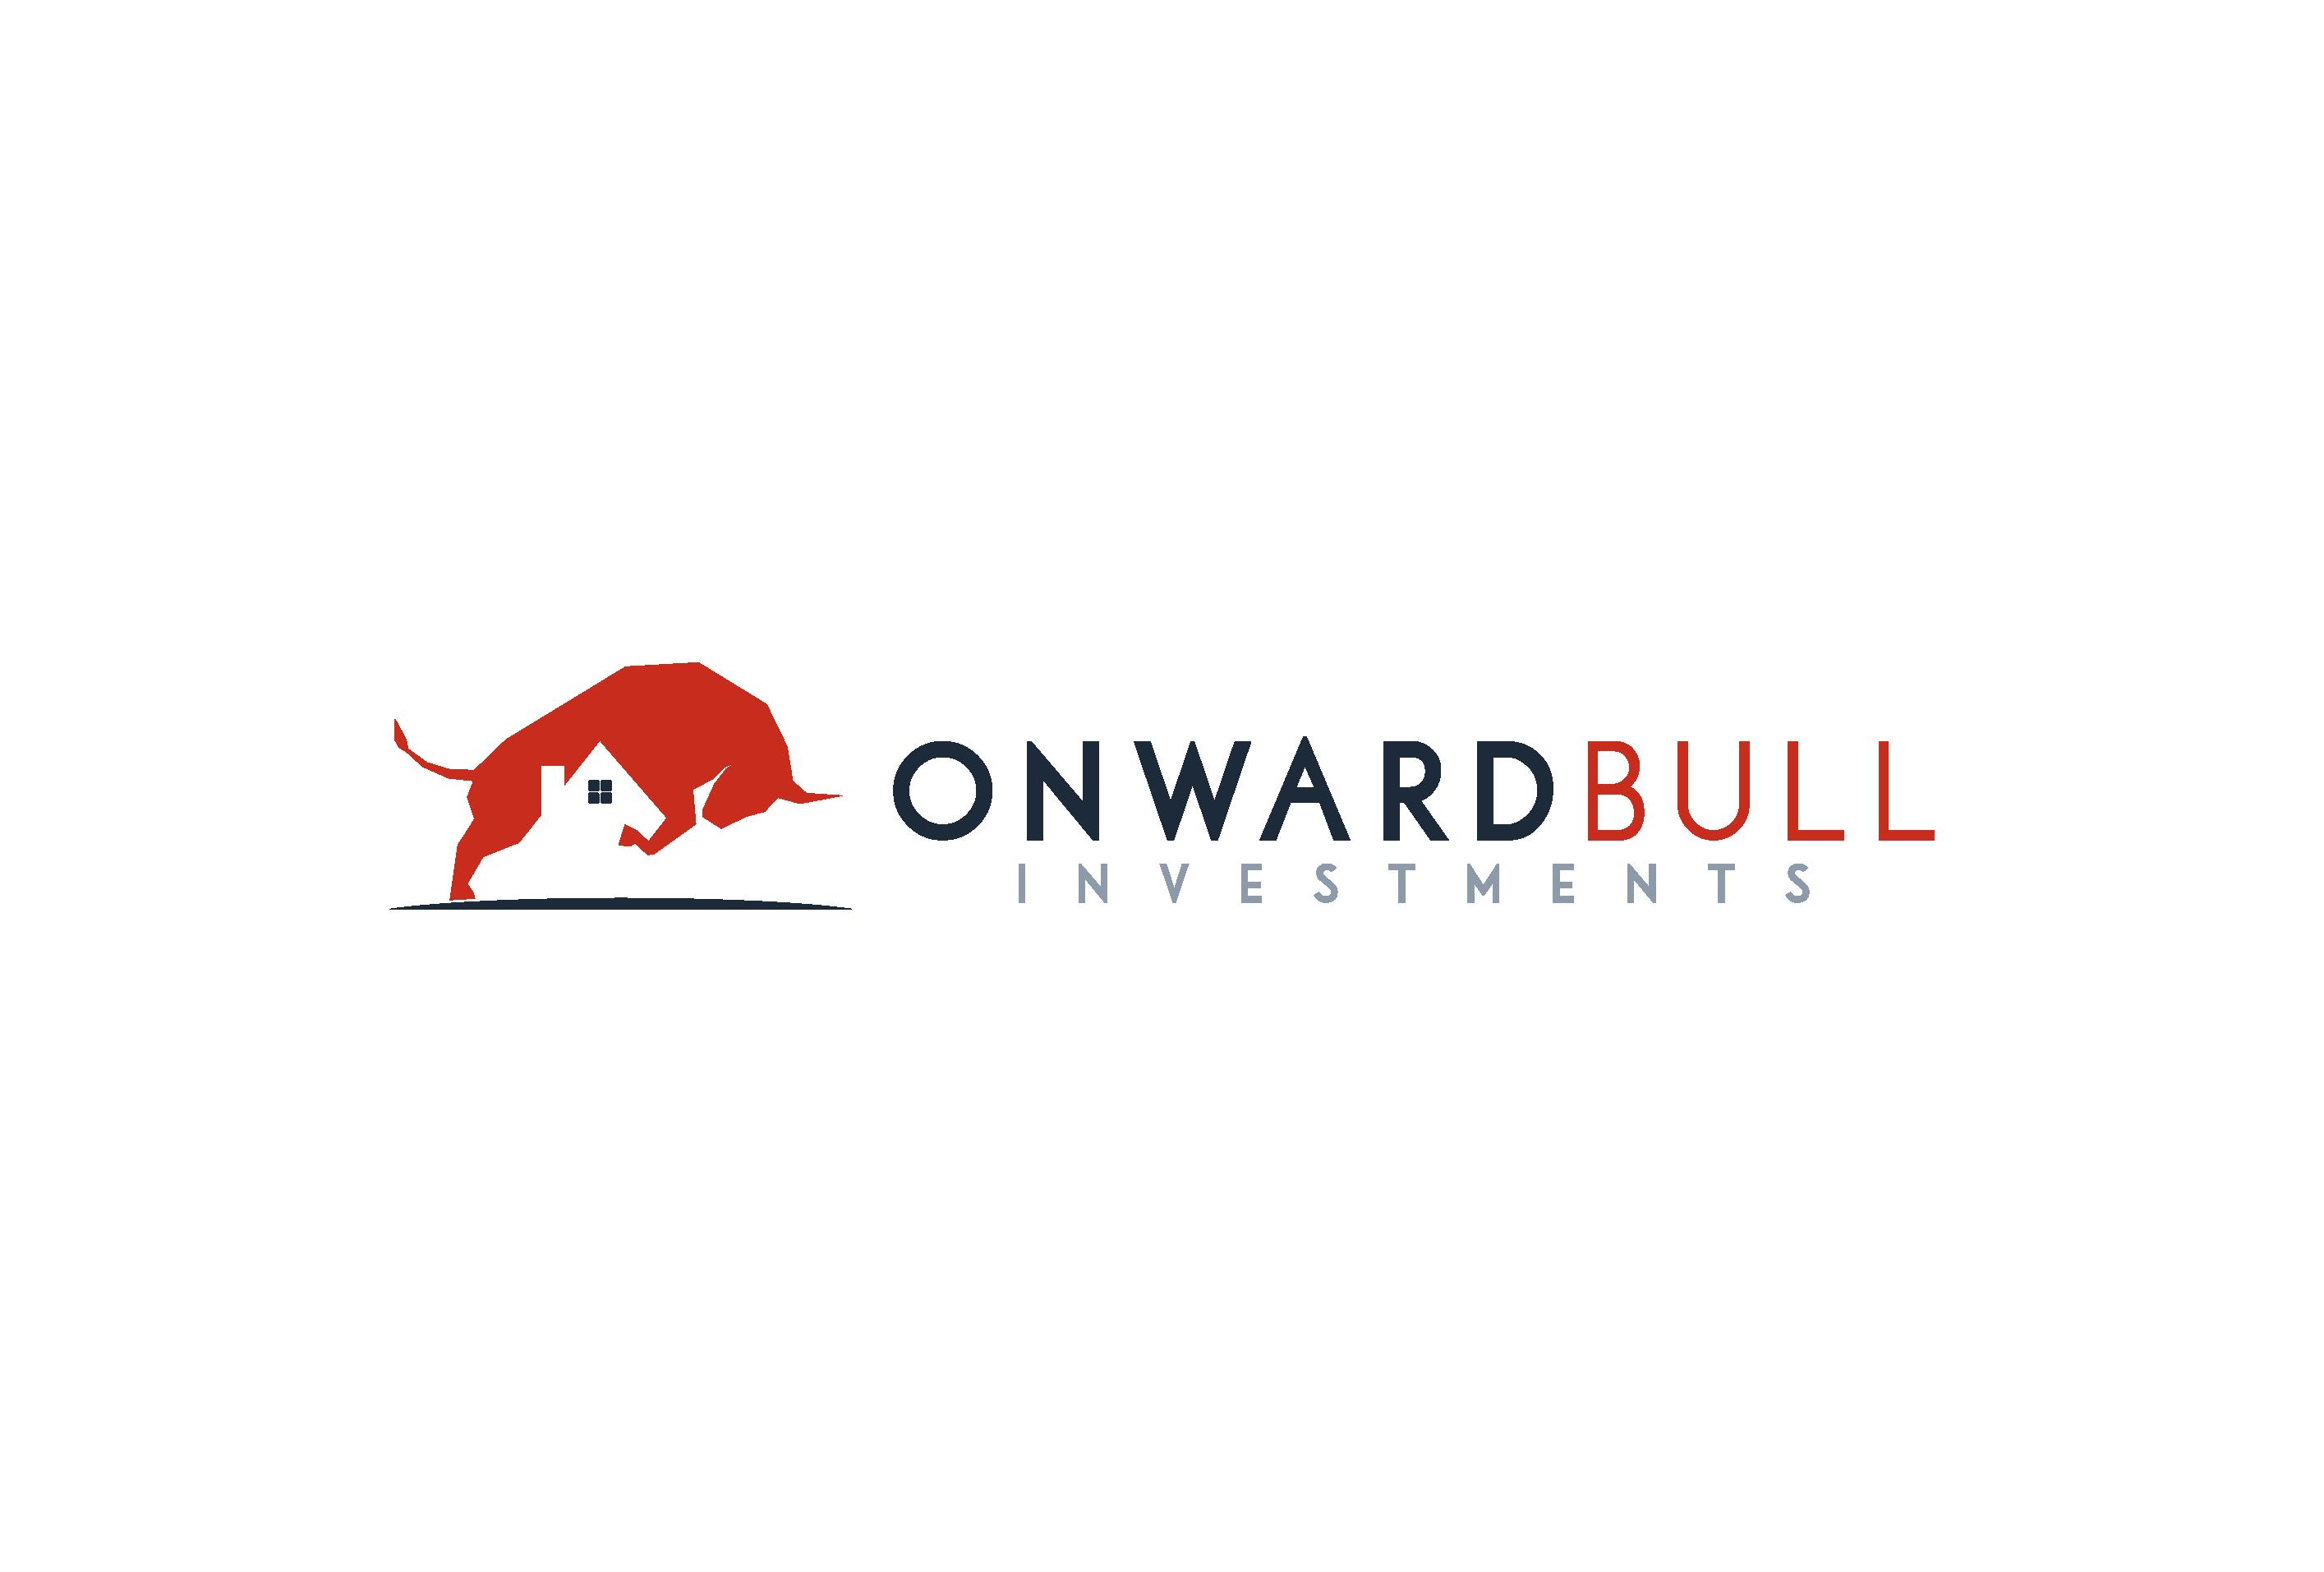 Onwardbull Investments Logo